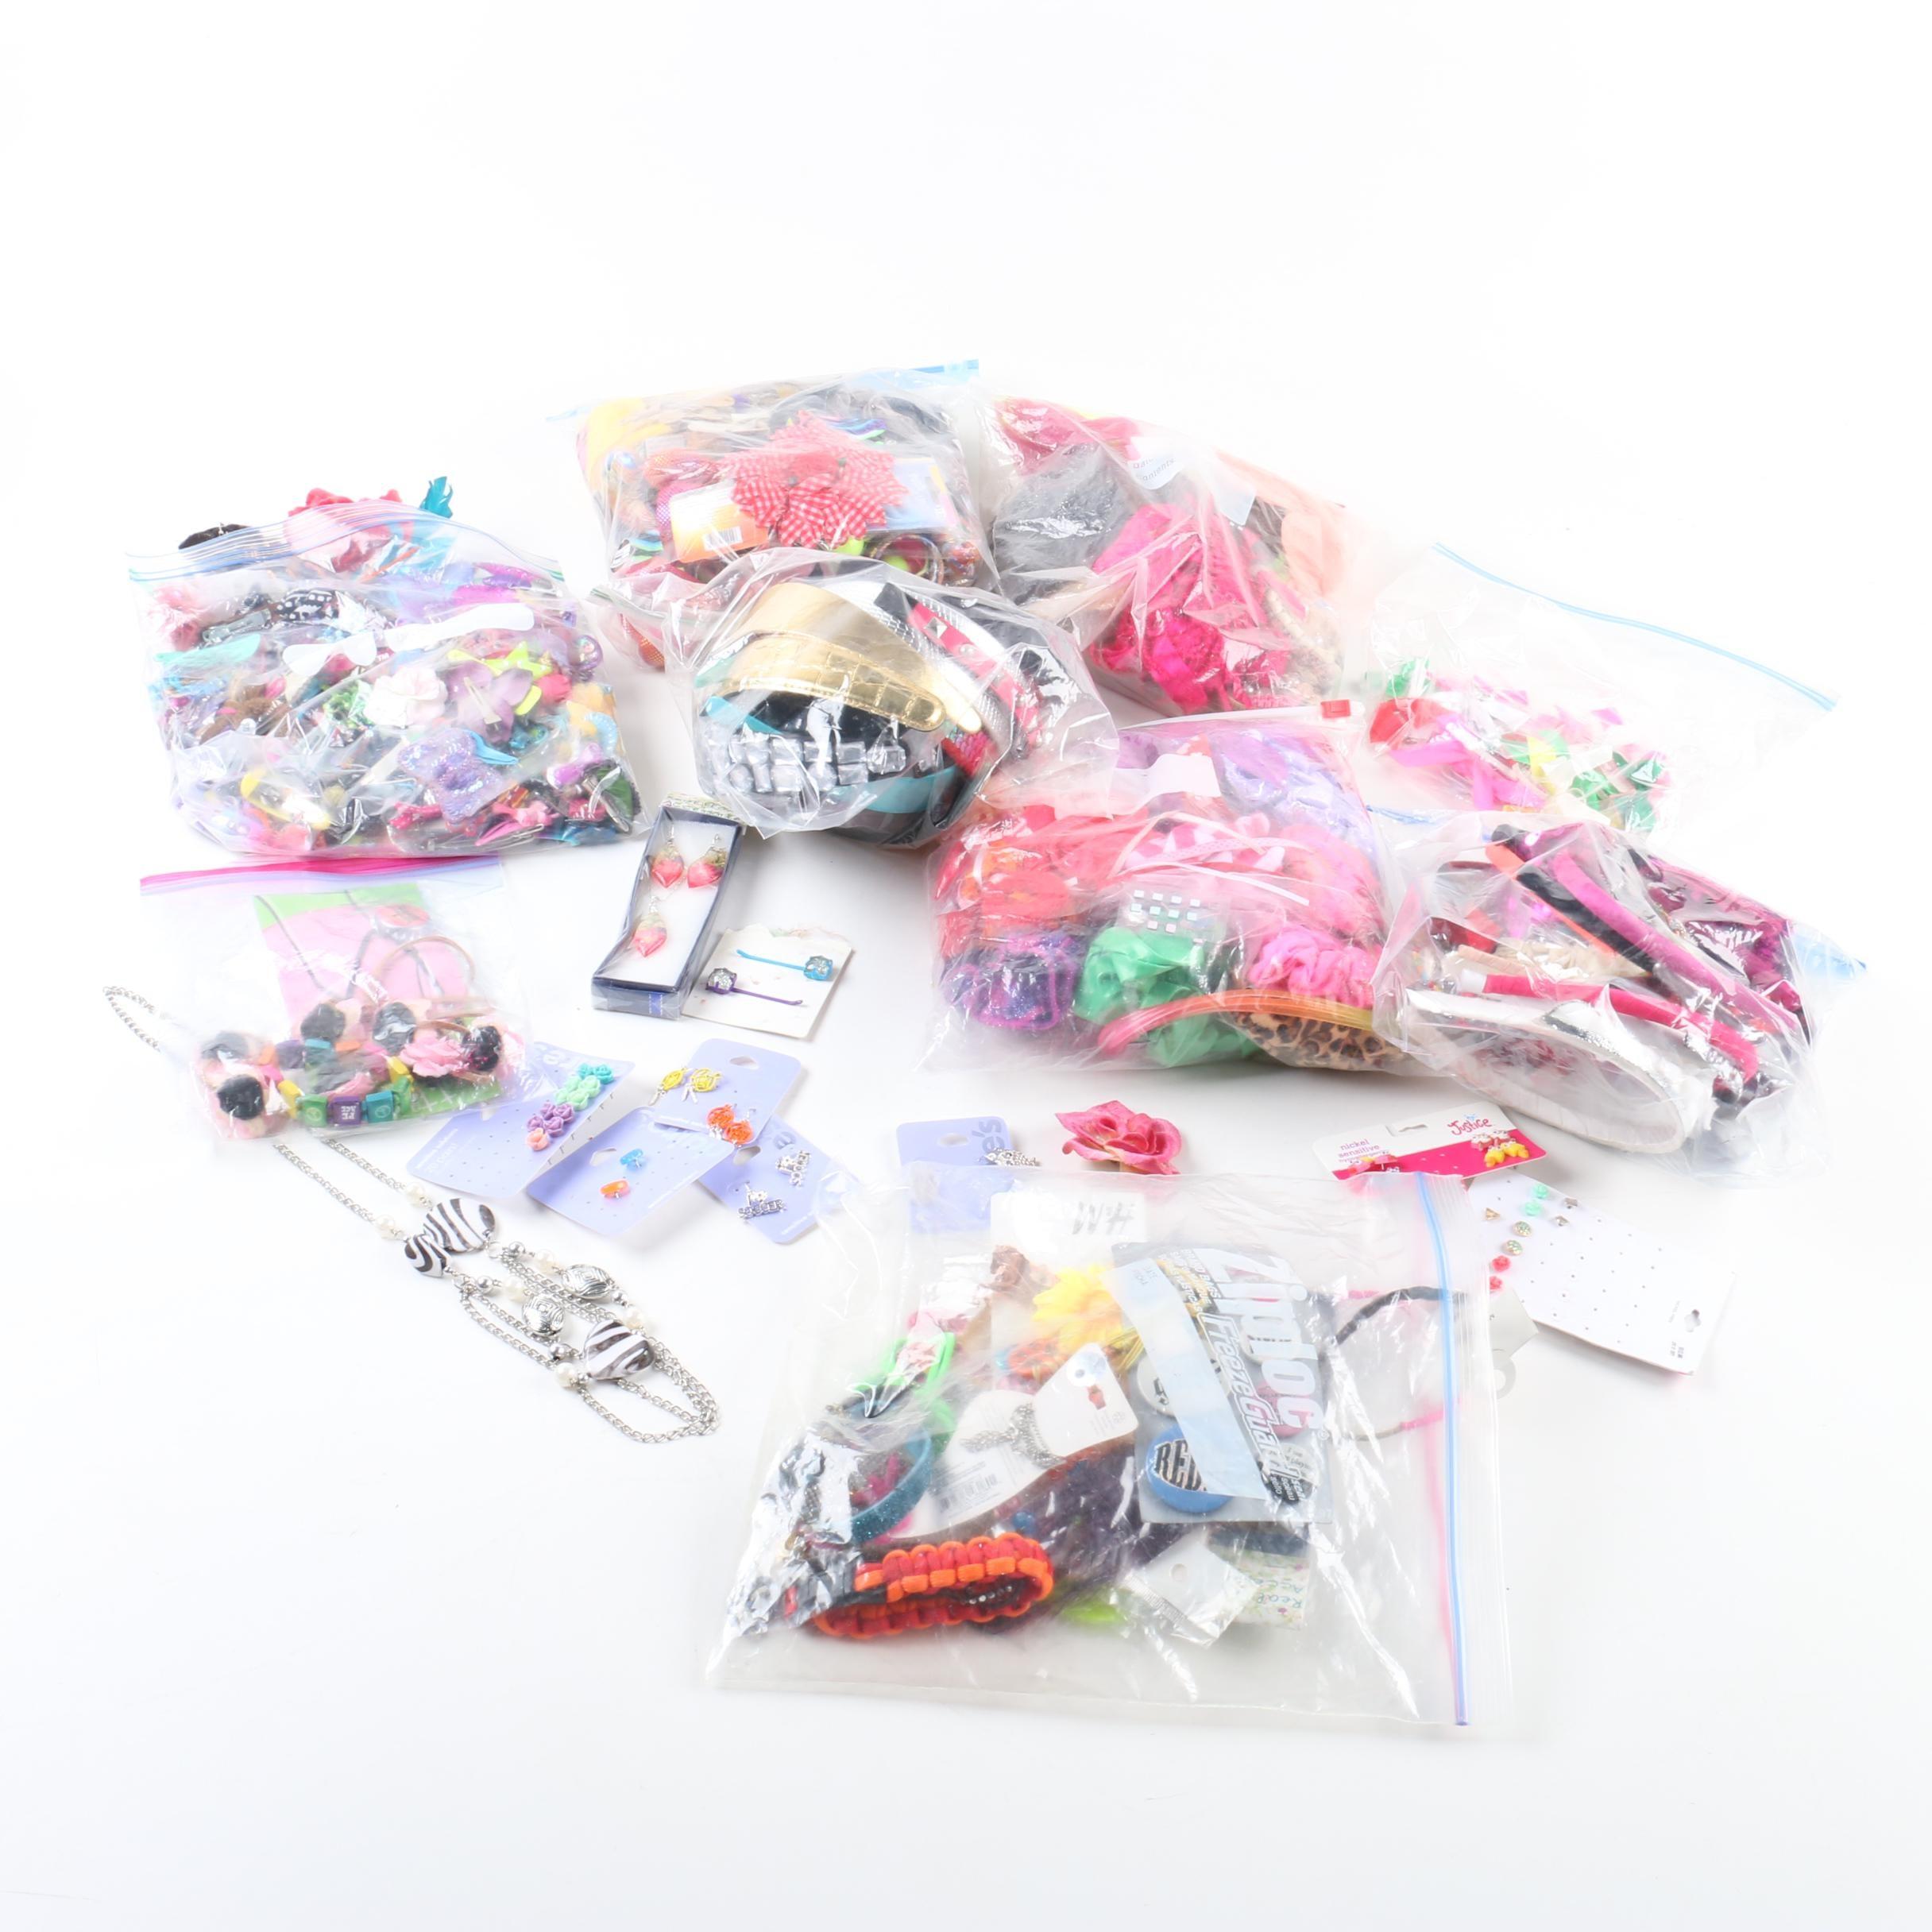 Assortment of Hair Accessories Including Handbags